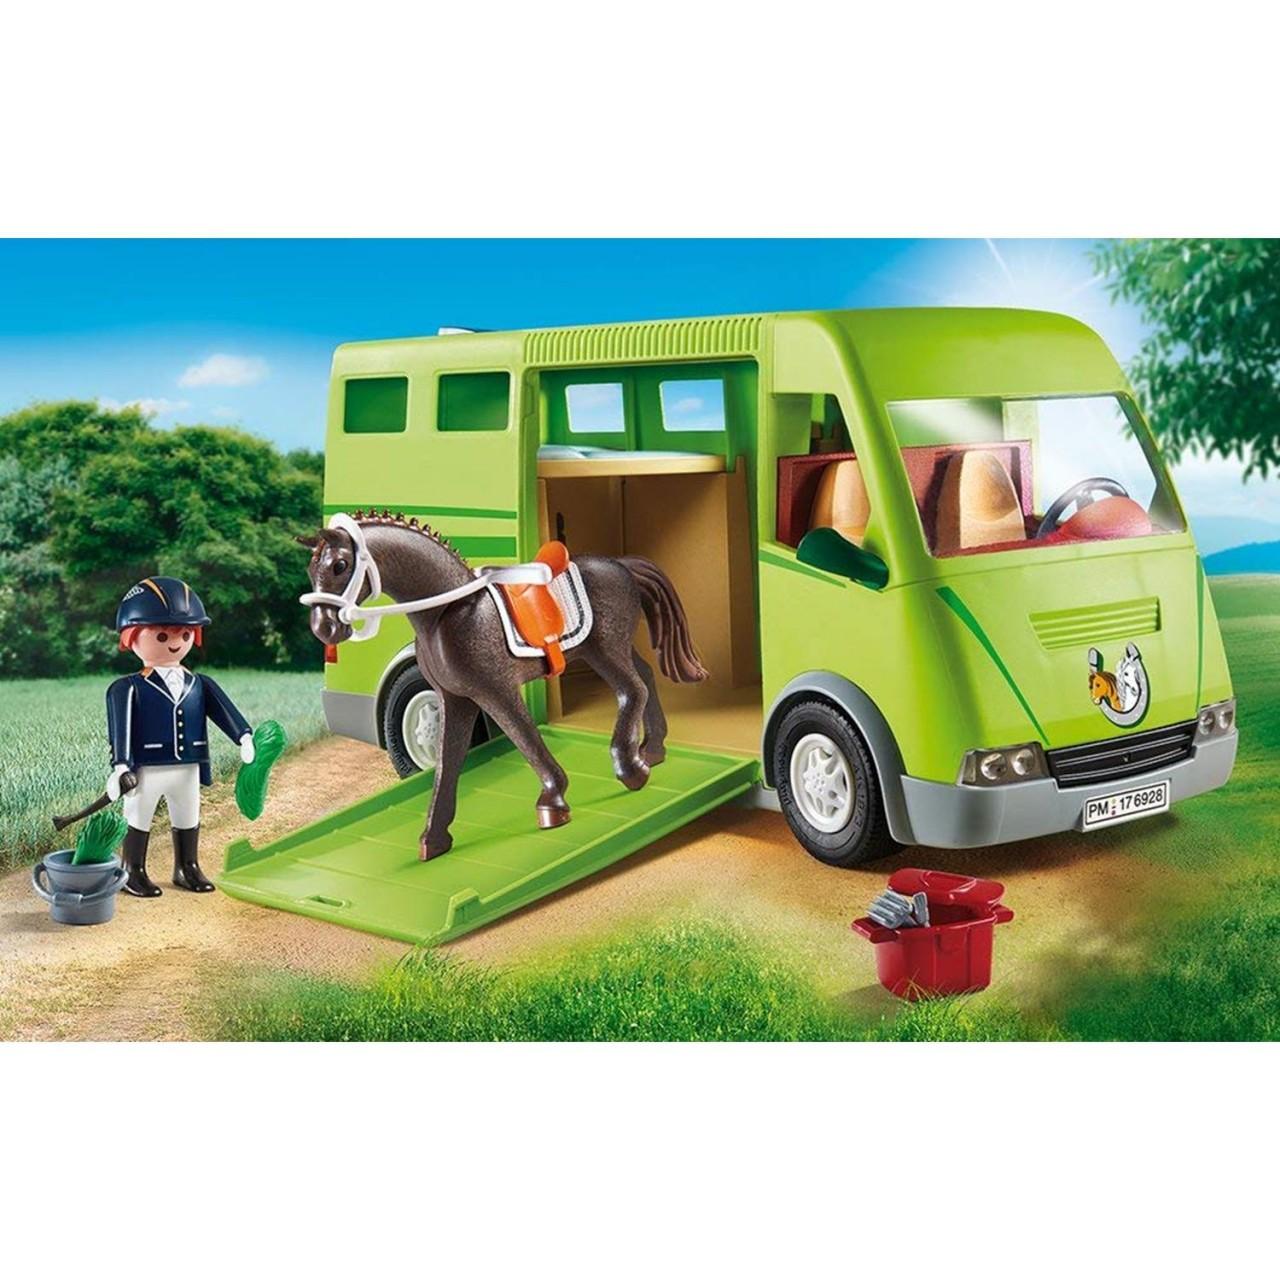 Playmobil 6928 Pferdetransporter